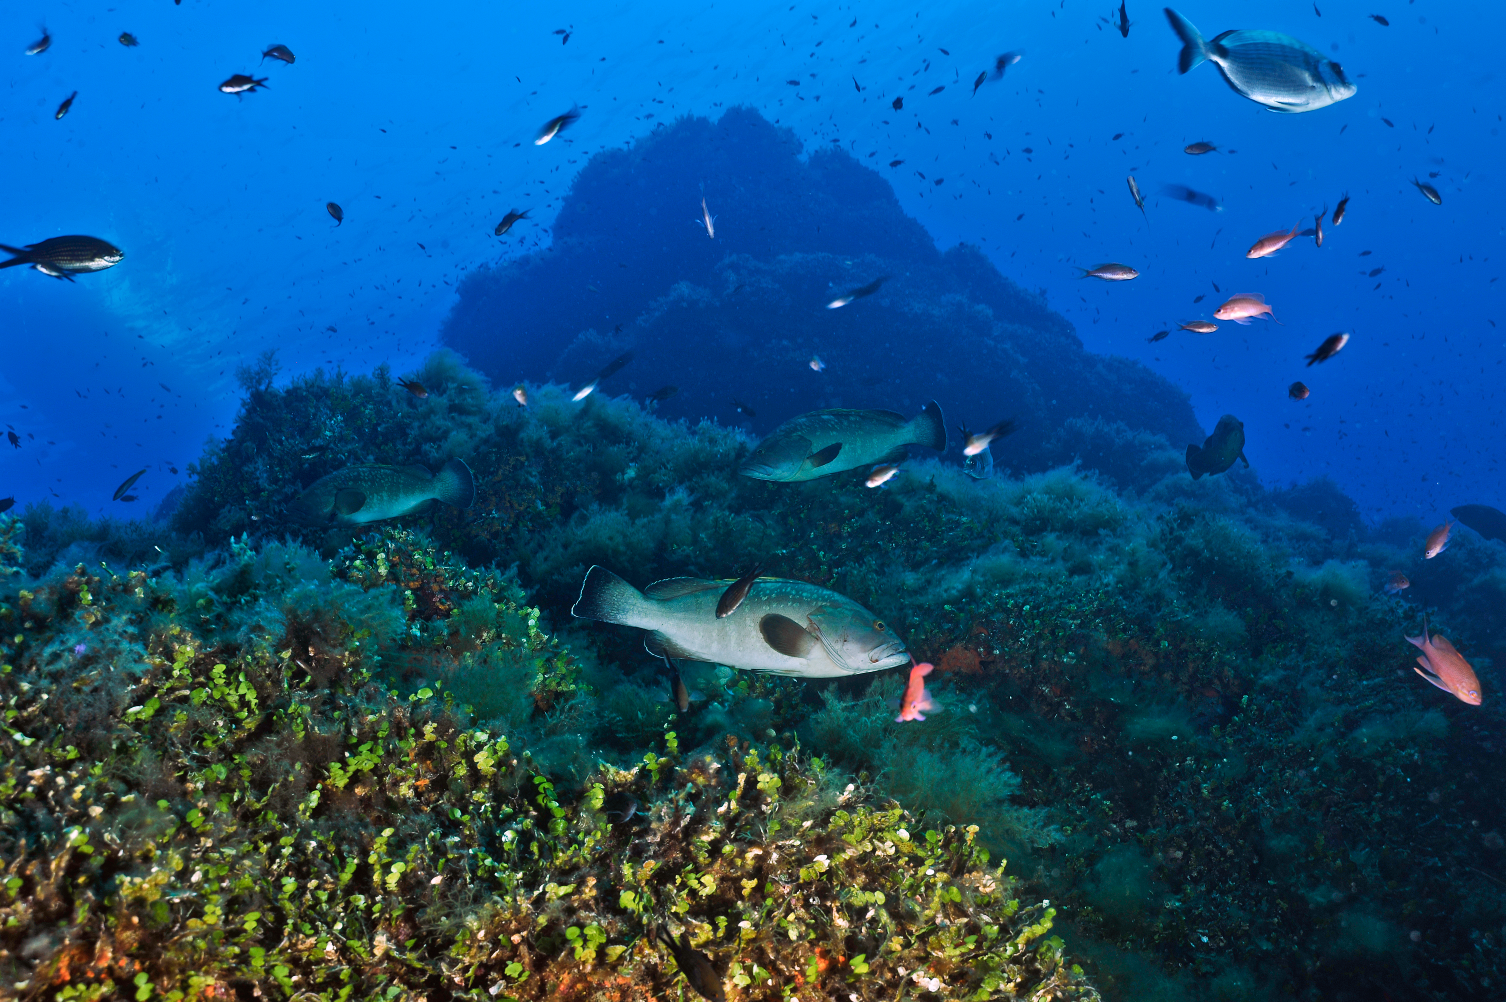 Oceani; una guida globale per proteggerli